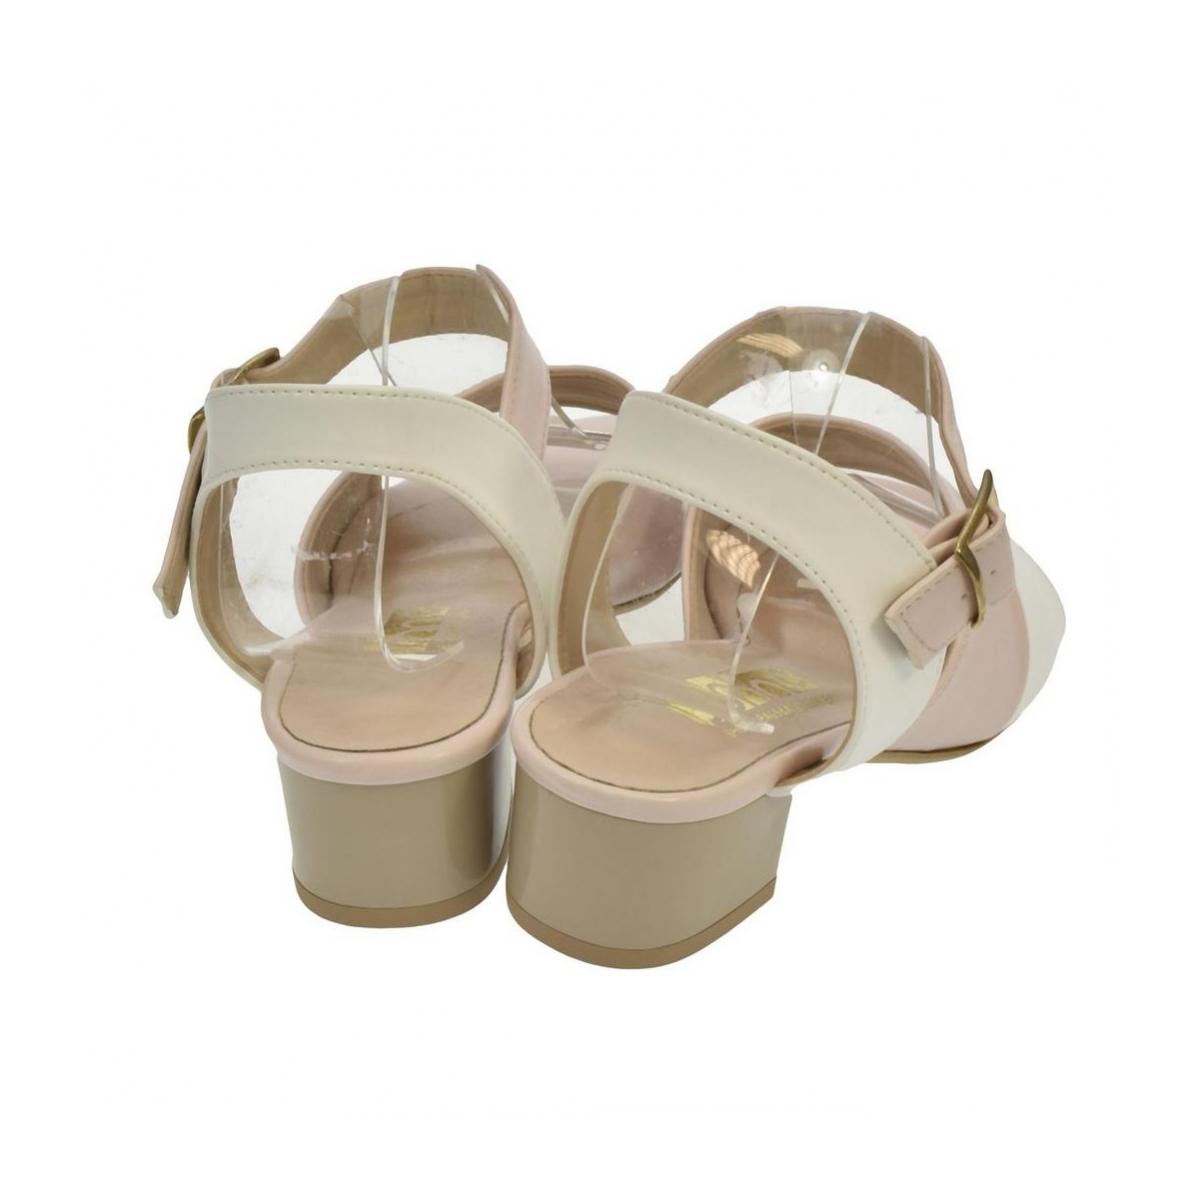 9788e00e650e5 Dámske ružovo-biele sandále ZARI   Johnc.sk